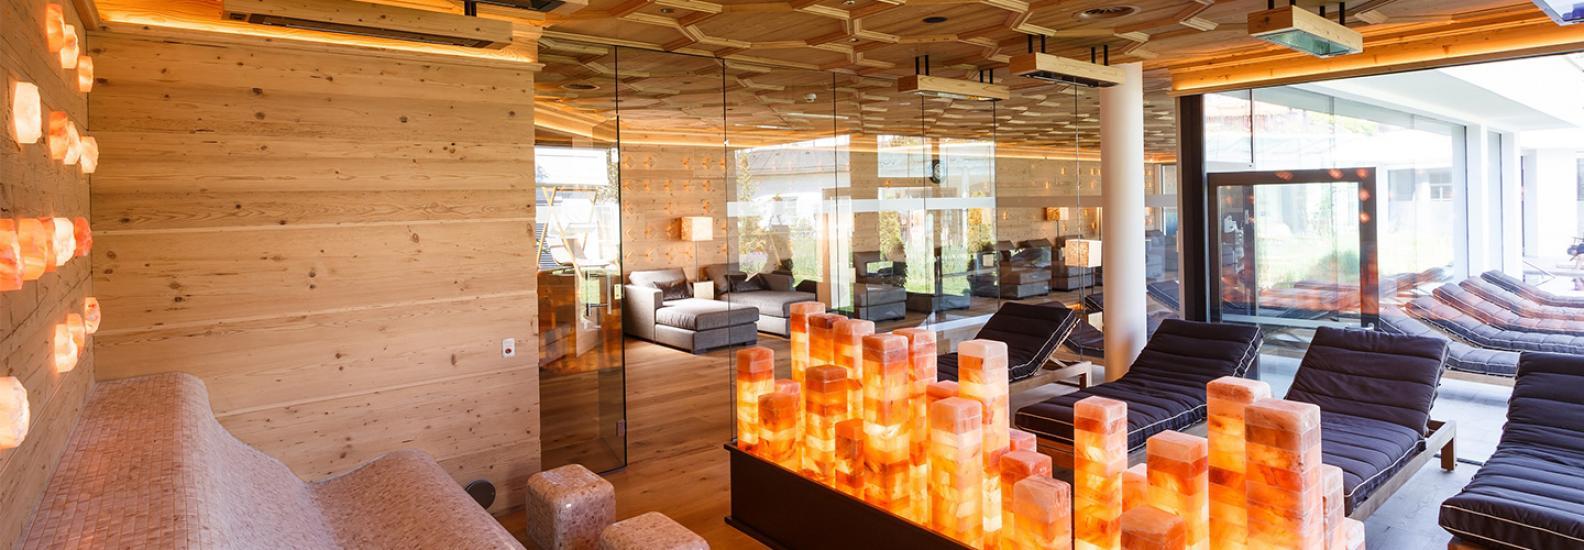 devine - Solegrotte - Hotel Peternhof